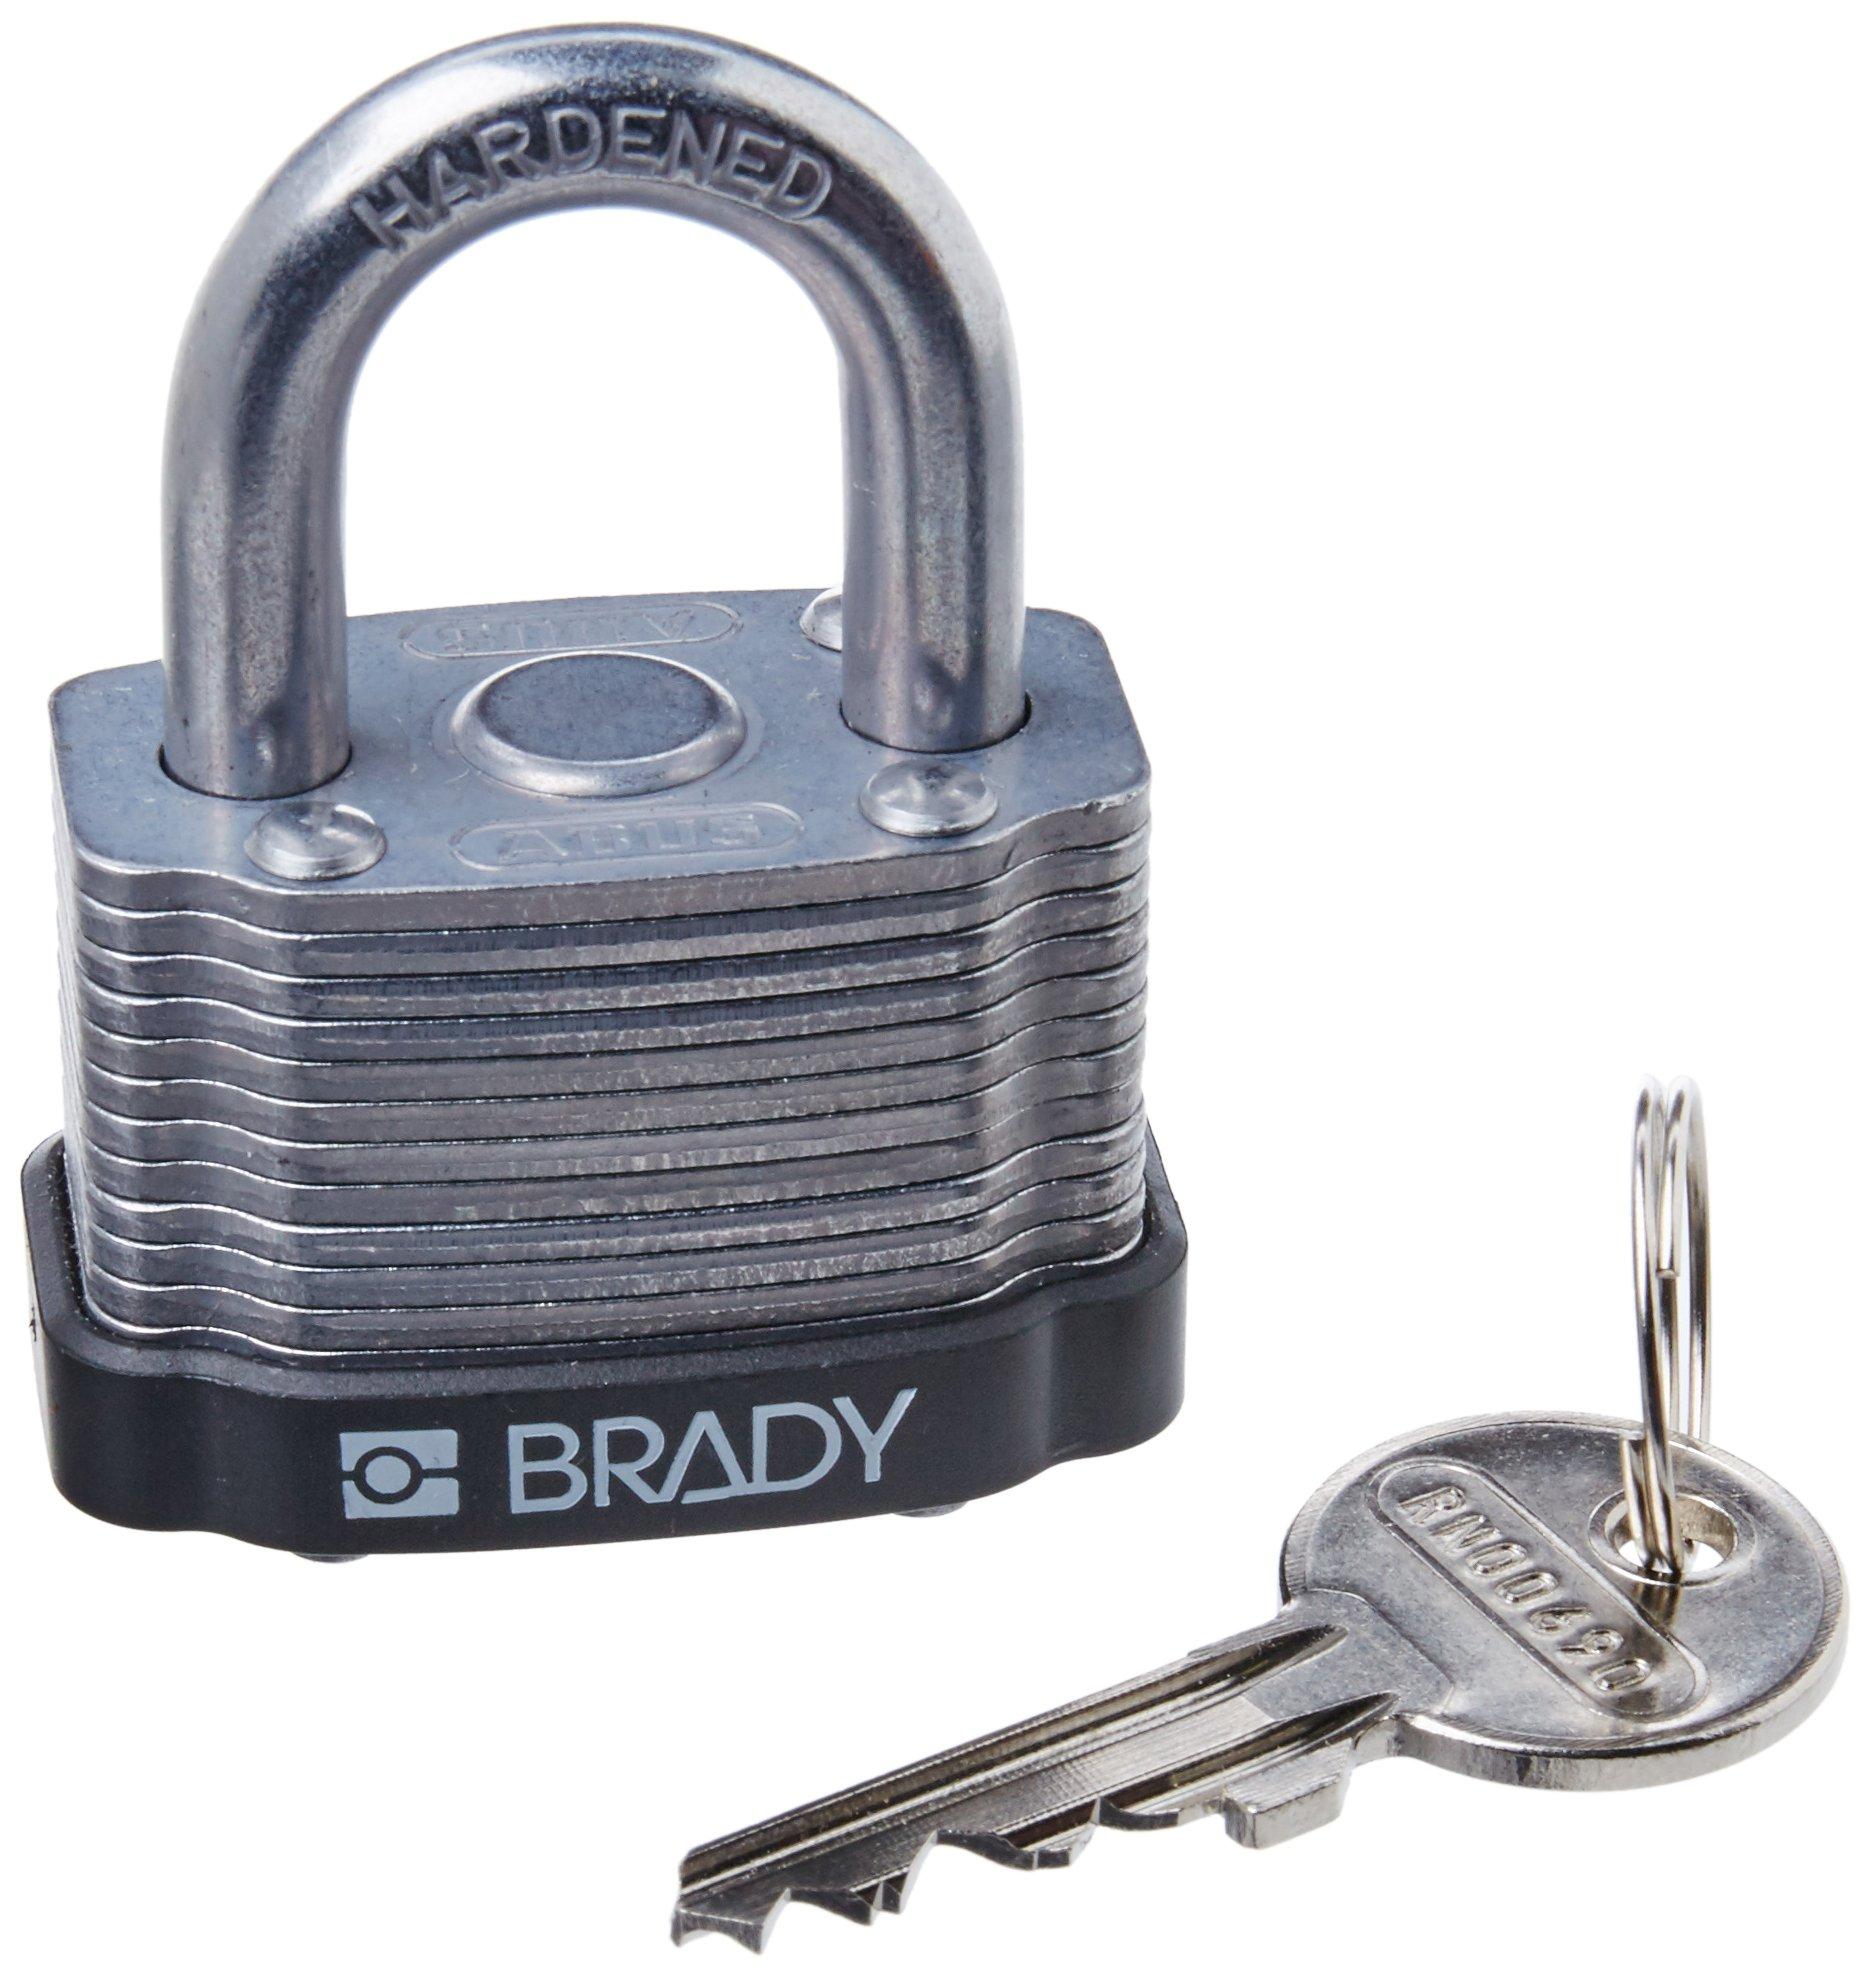 Brady 143136 Black Key Retaining Steel Padlock, 1-1/5'' Height, 1-5/16'' Width, Black